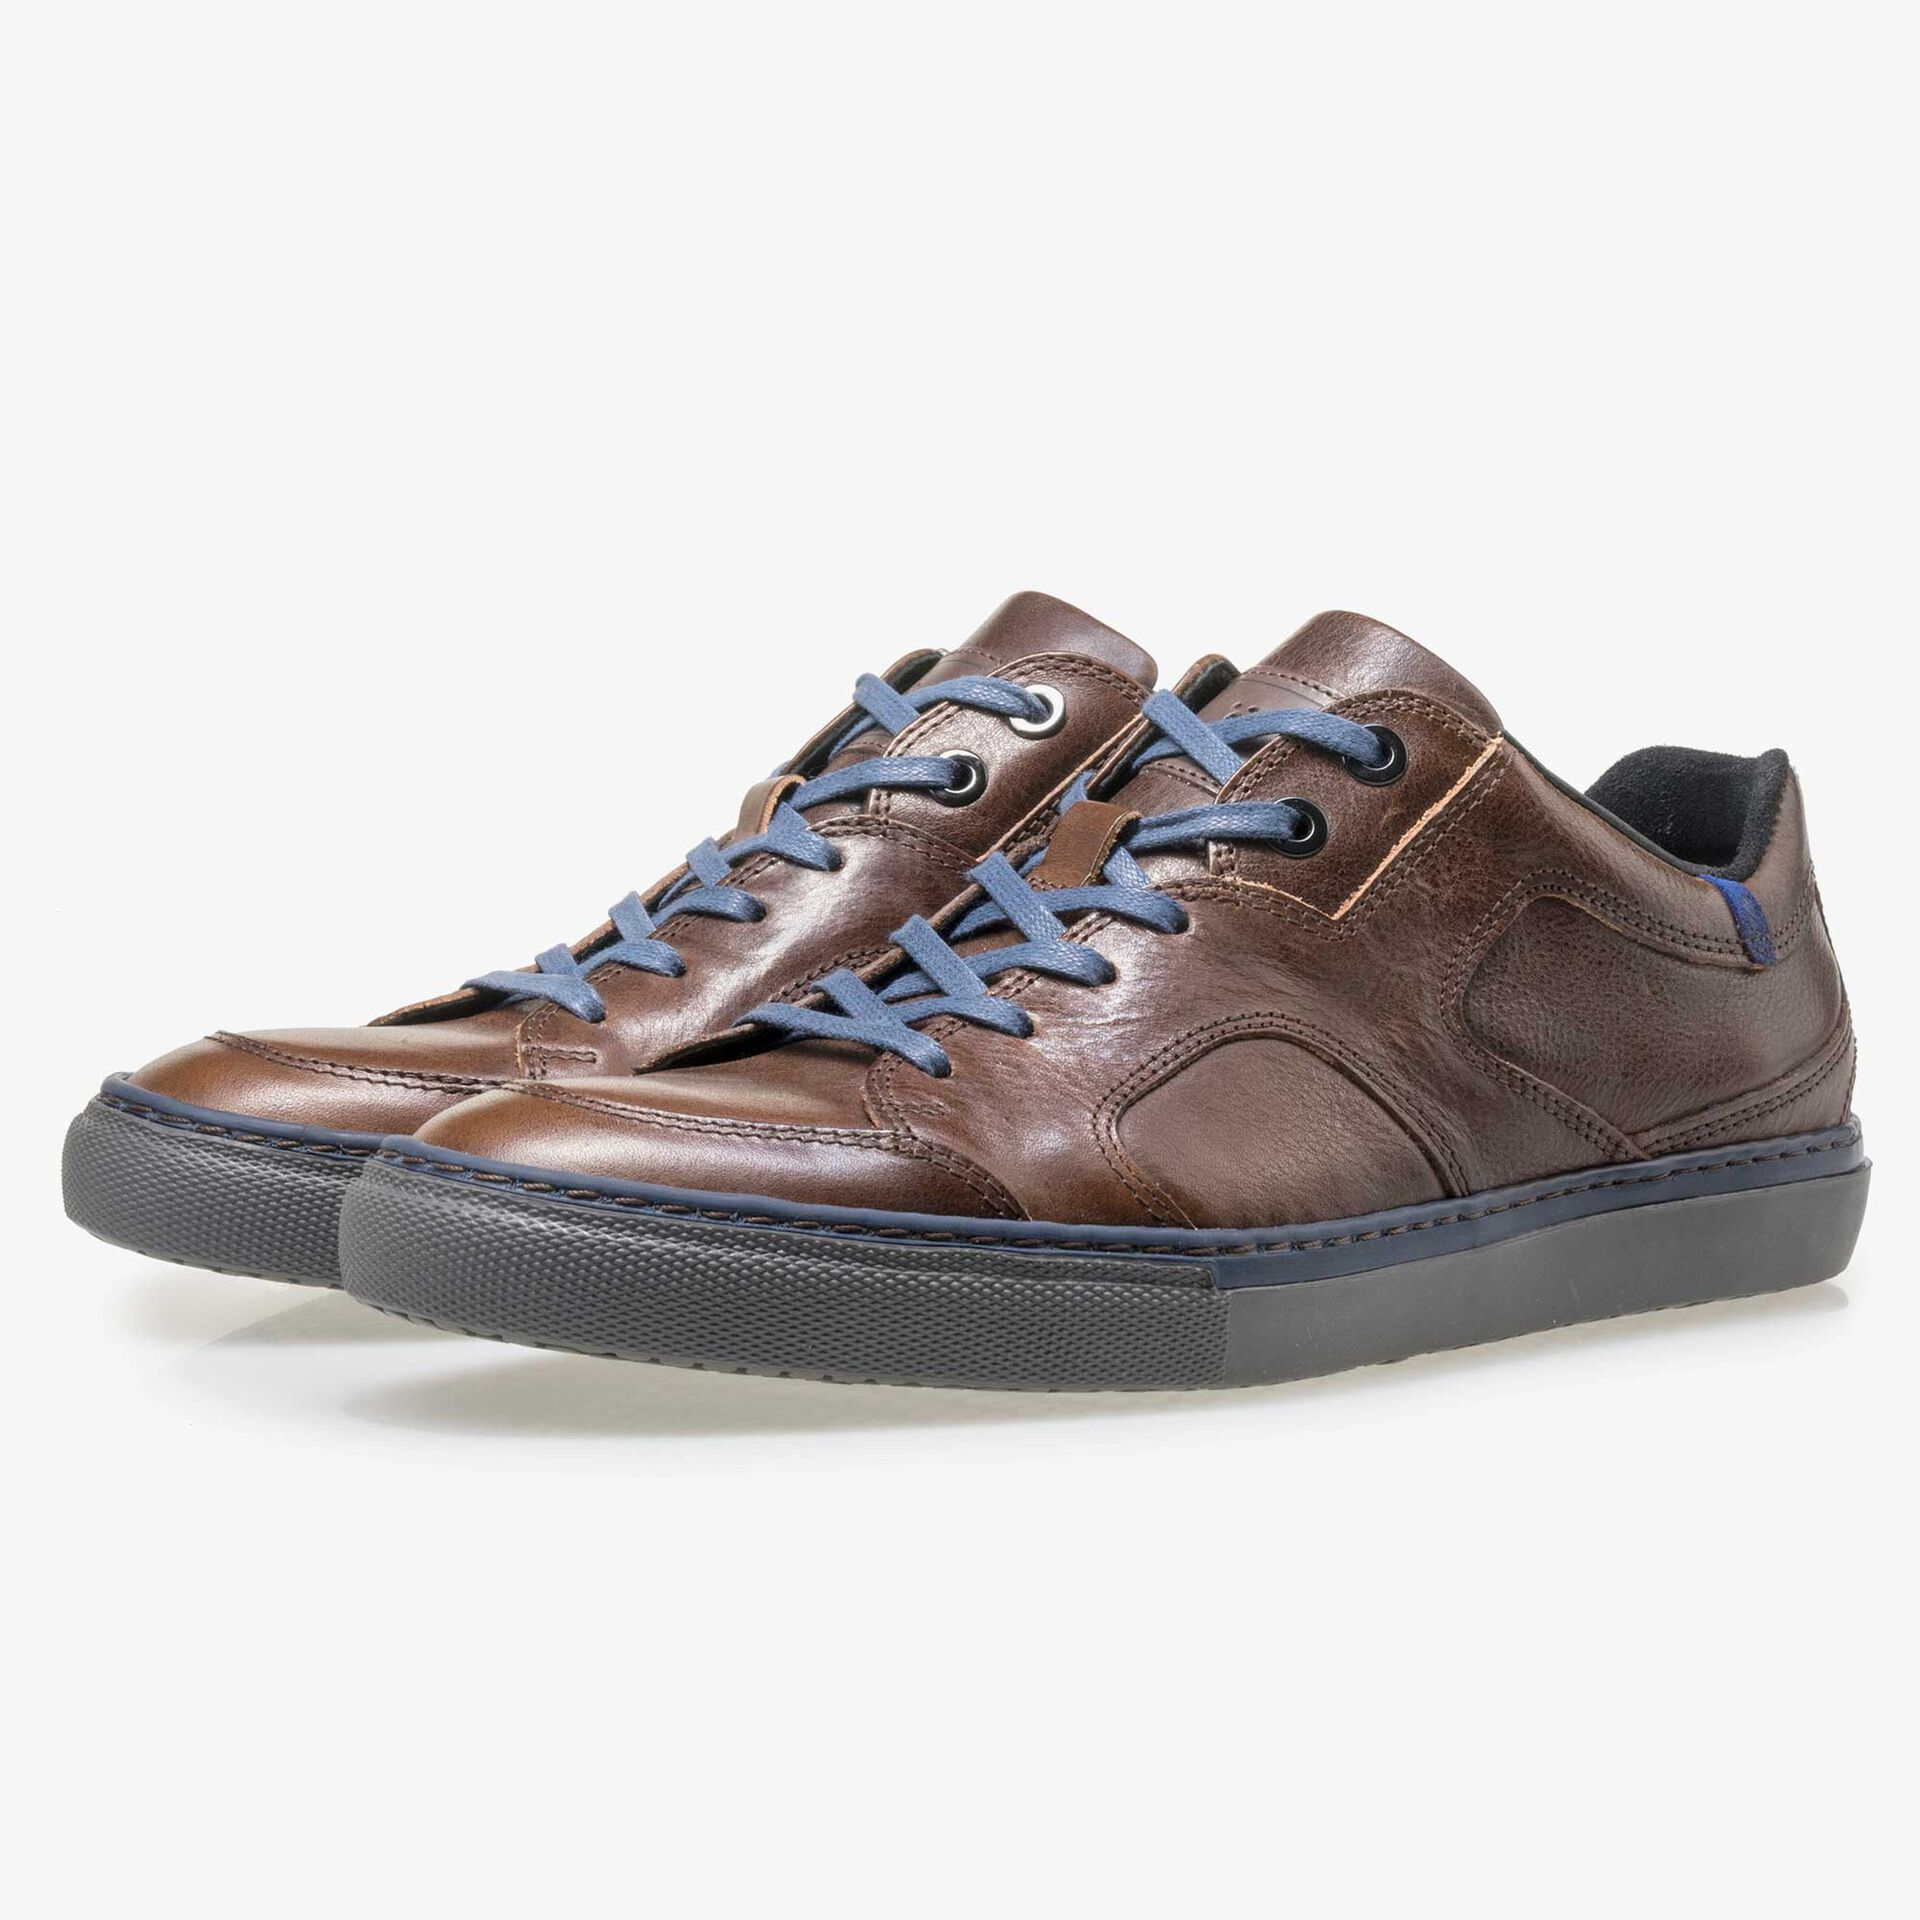 Floris van Bommel men's brown leather sneaker